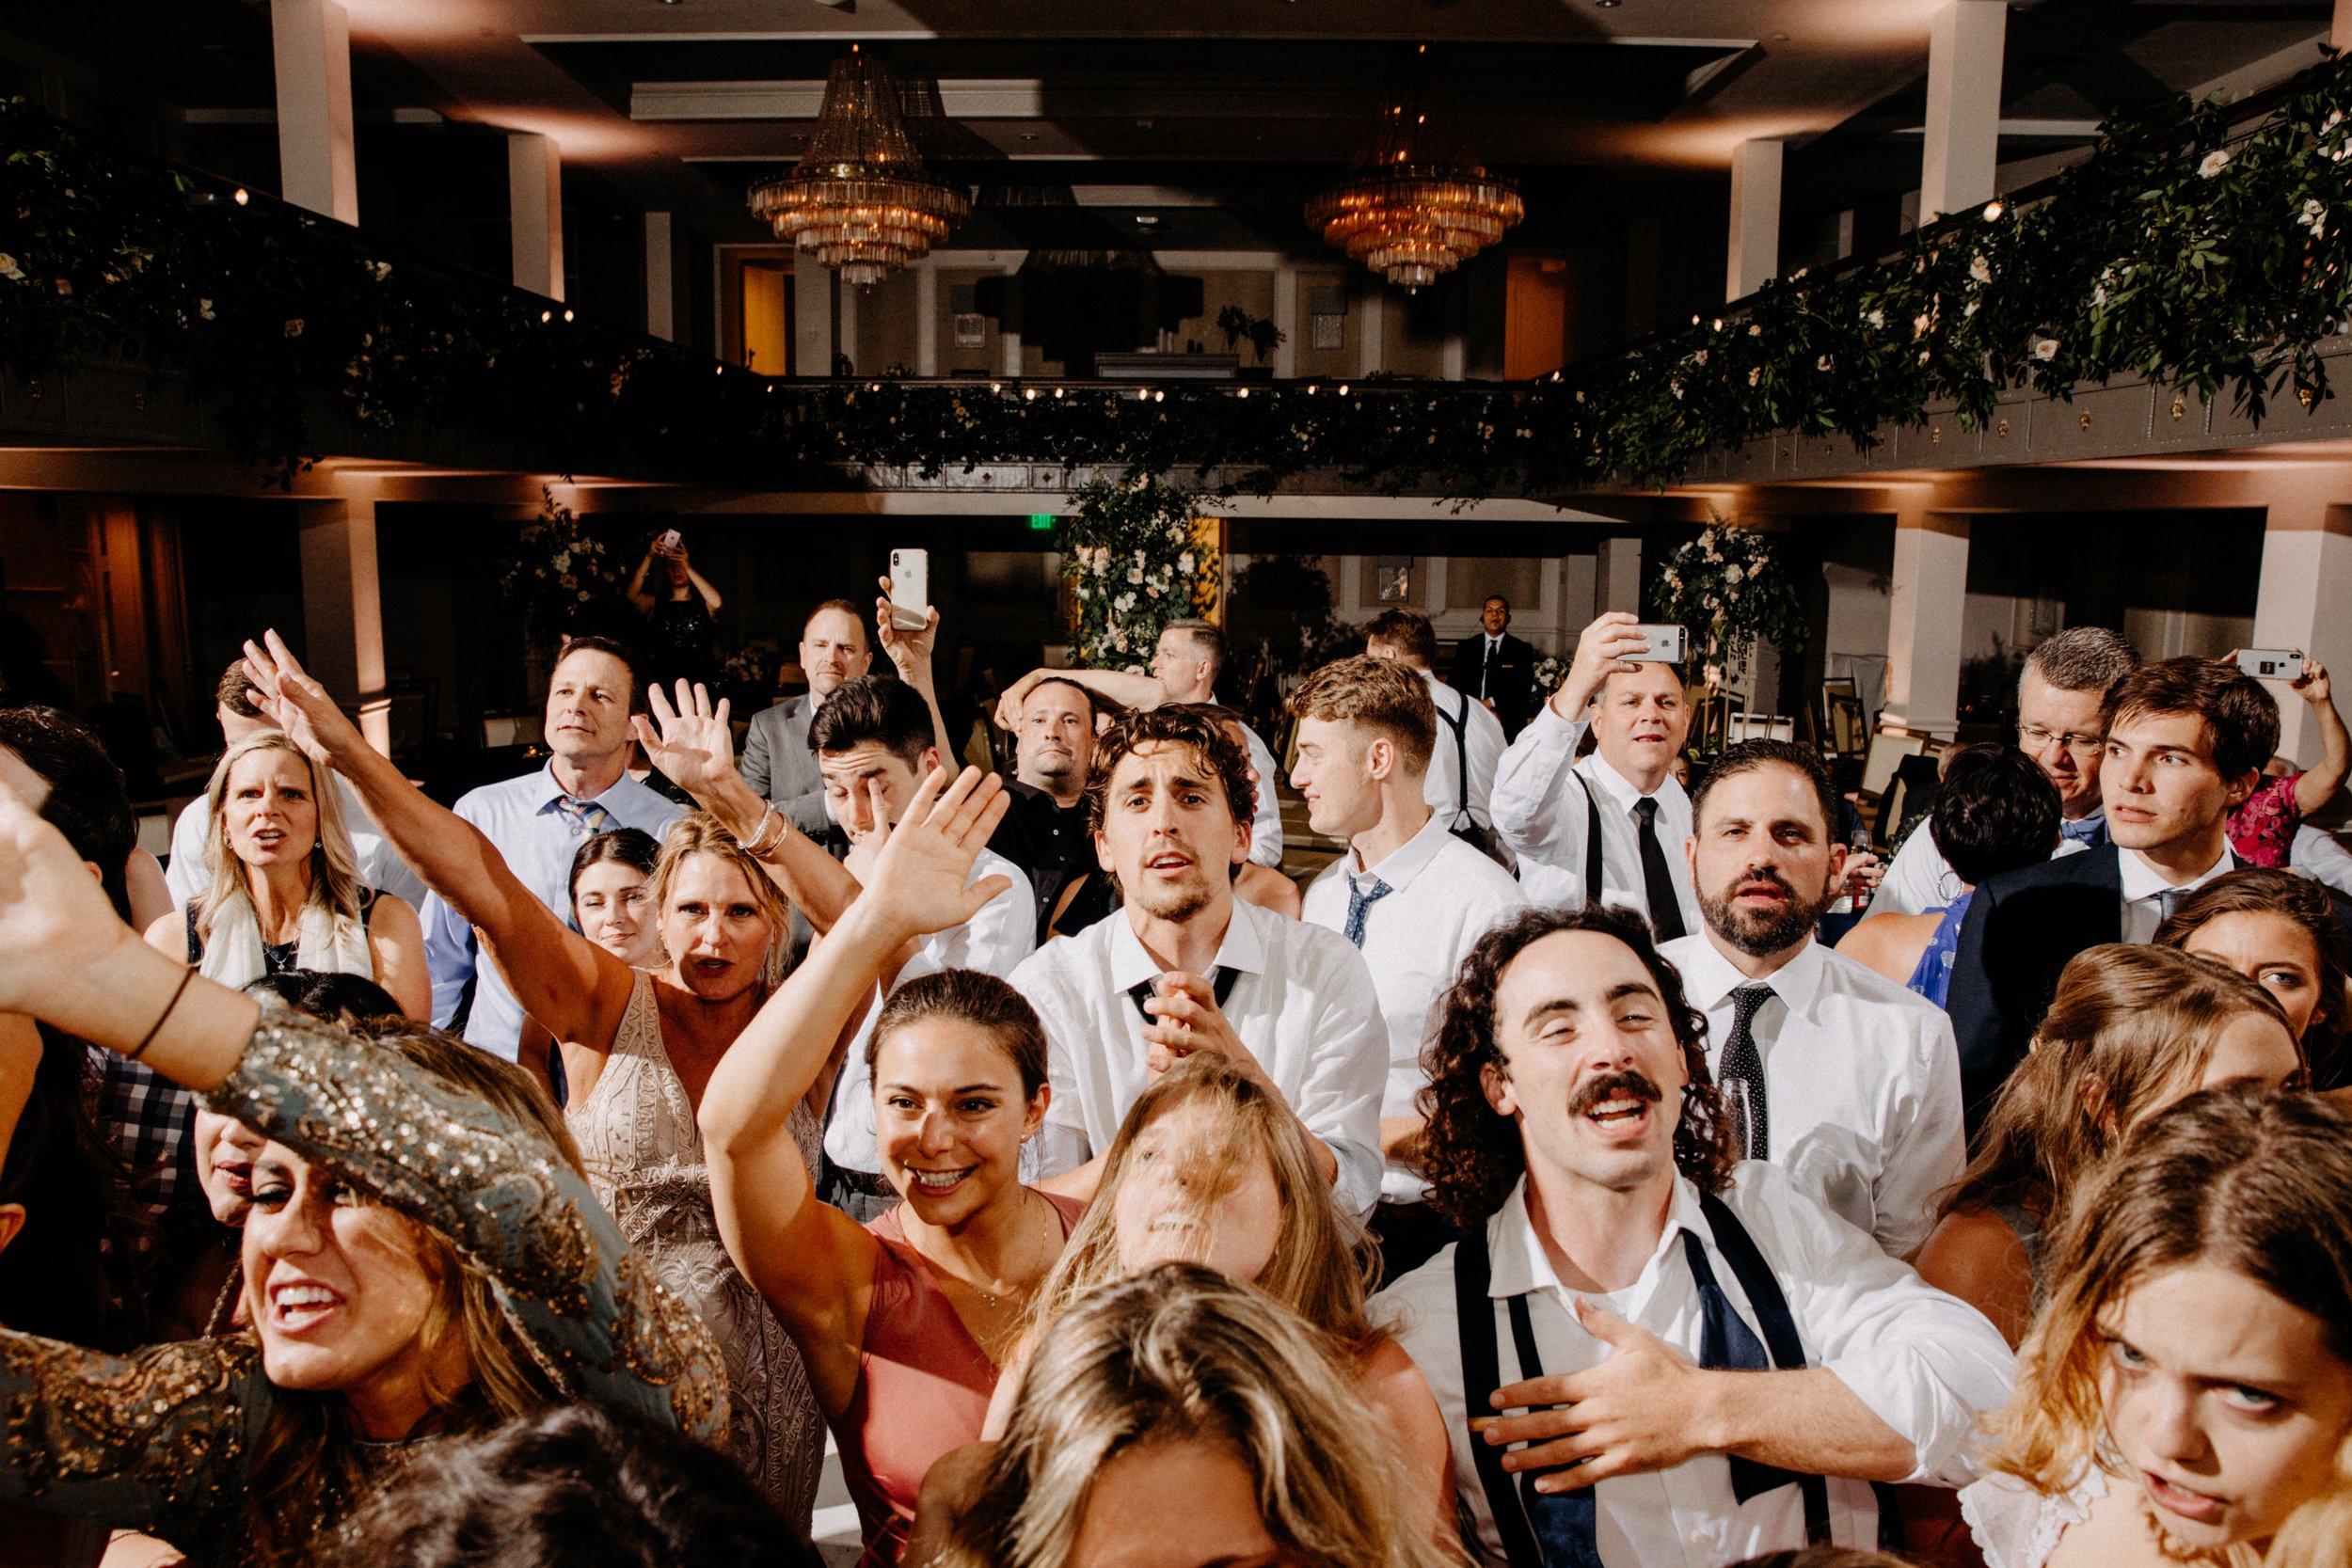 st-anthony-hotel-wedding-photography-10211san-antonio.JPG